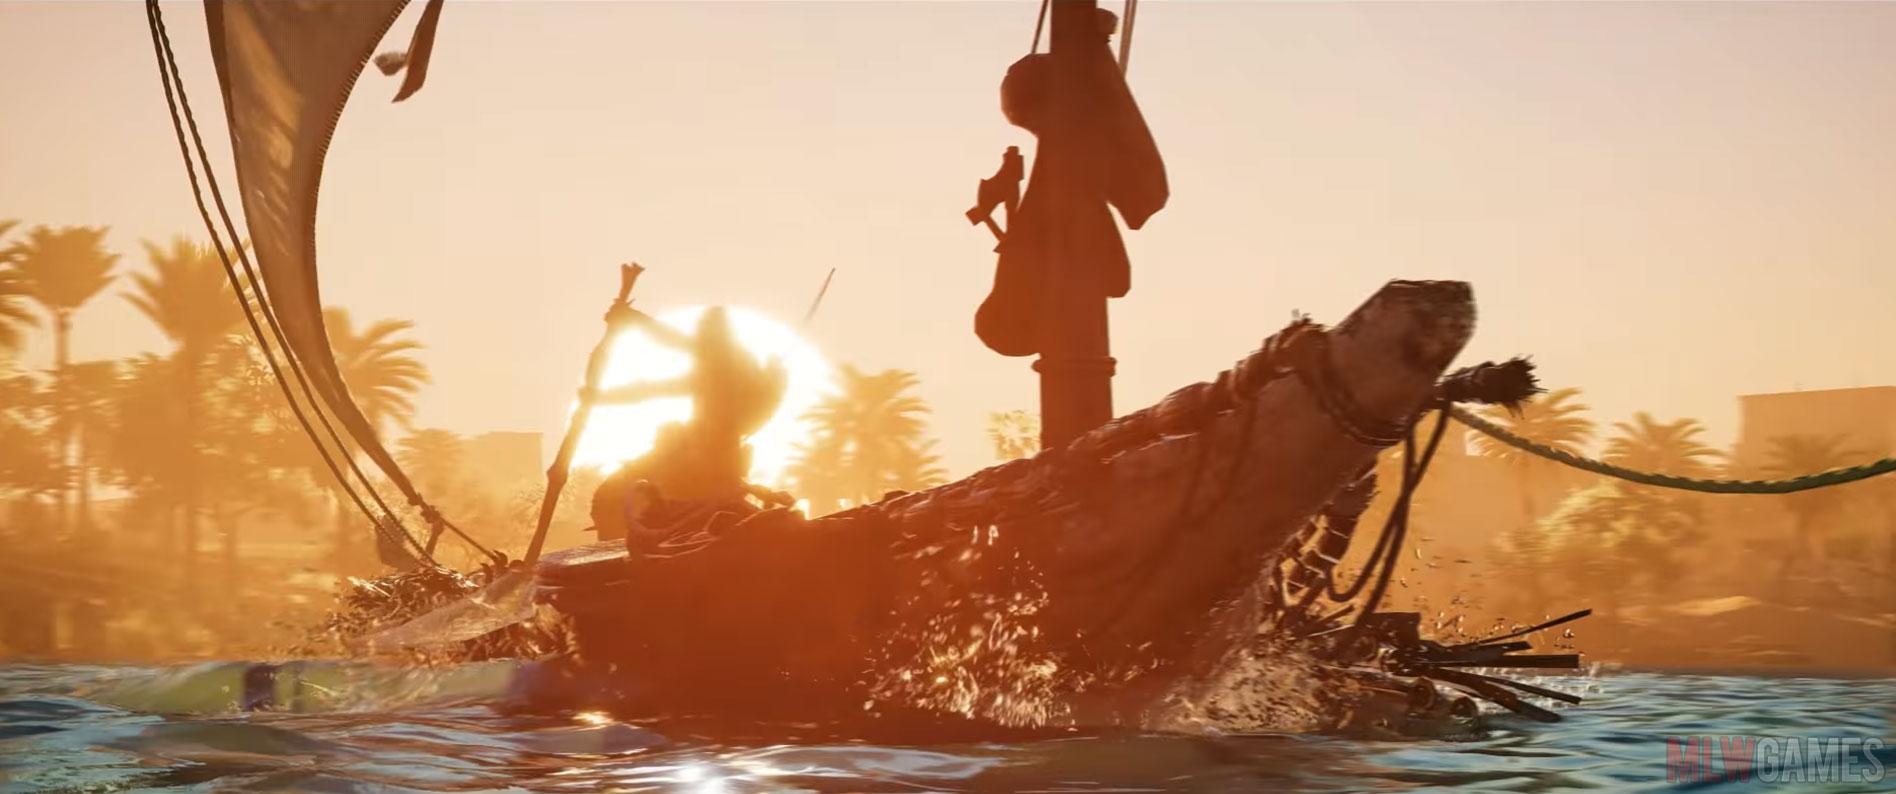 Assassins Creed Origins 16